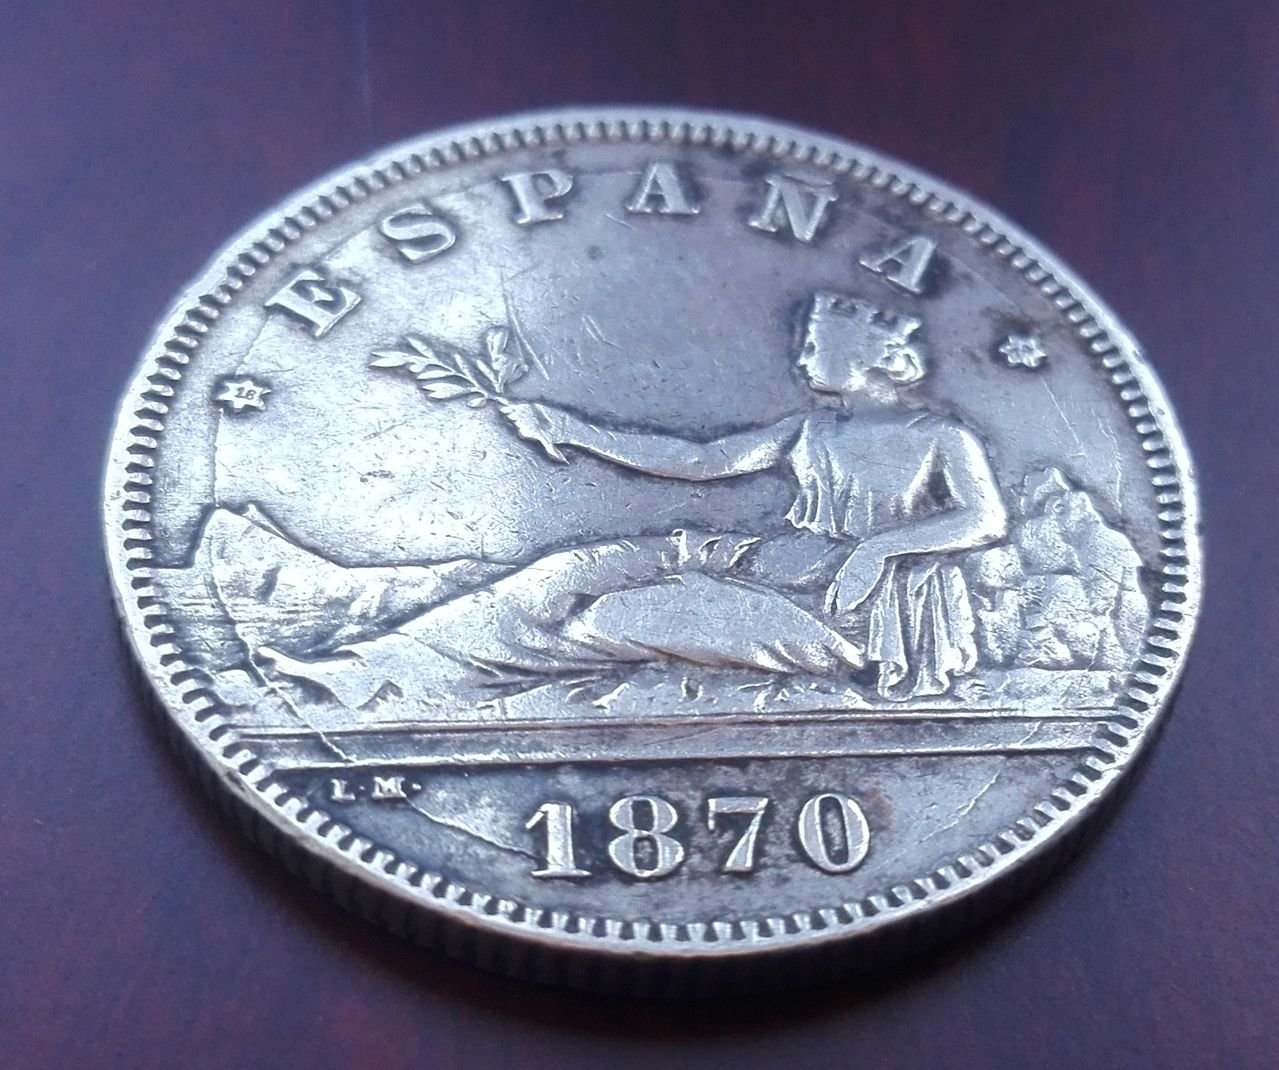 2 pesetas 1870 *74 2_pesetas_1870_74